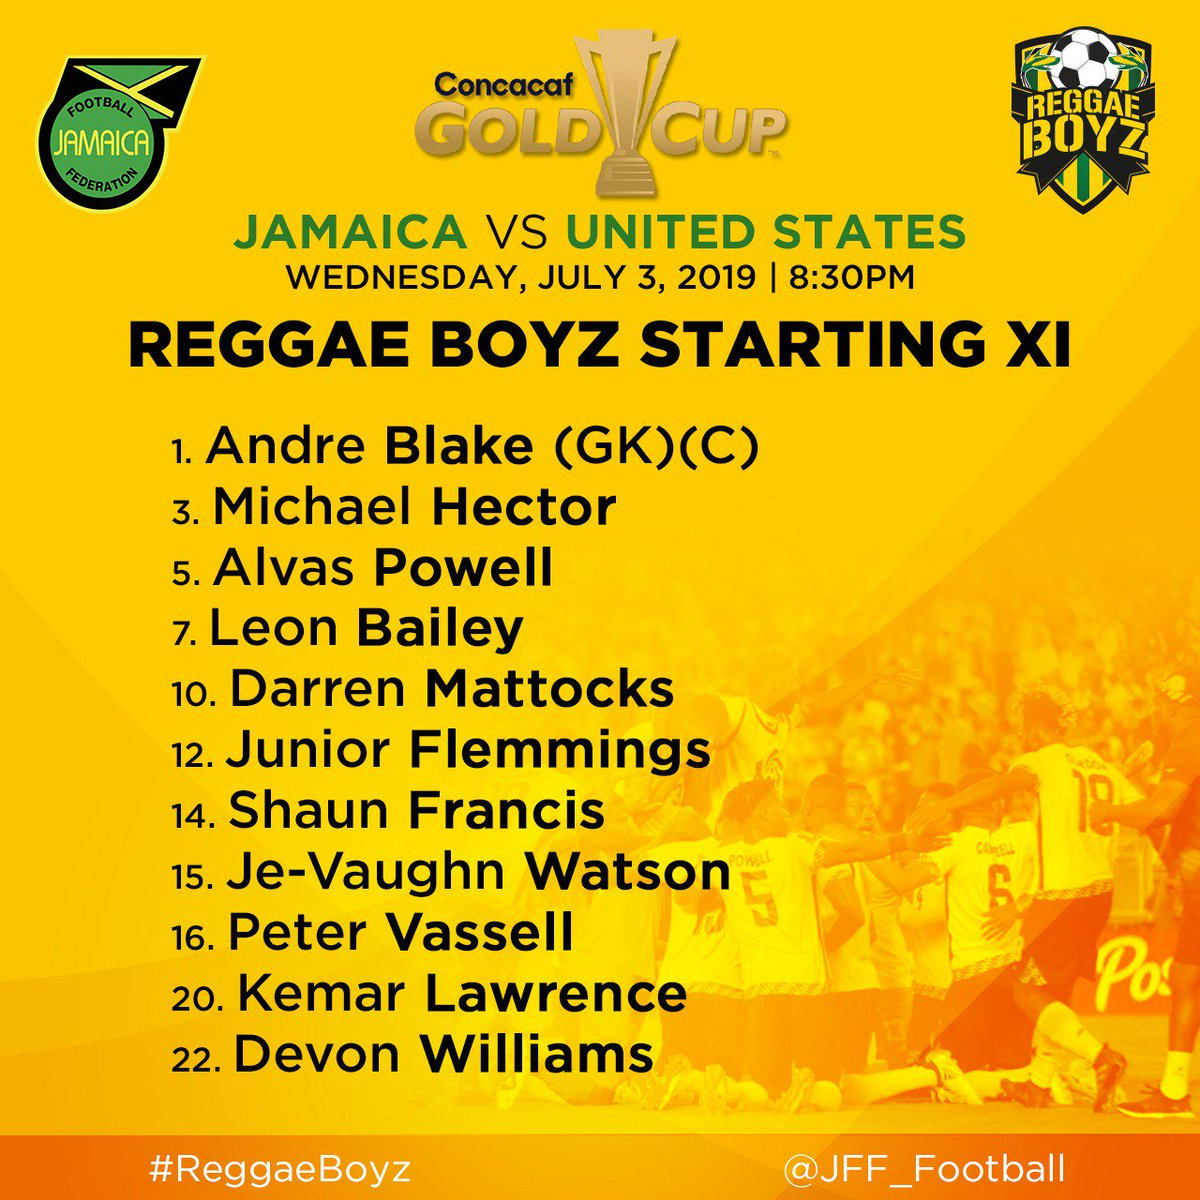 || Matchday 🇯🇲 vs 🇺🇸 || Senior #ReggaeBoyz starting XI for their game against United States! ||#2019GoldCup 🏆 Matchtime: 8:30pm(JA Time)  #JFFLive #ReggaeBoyz #GoldCup #ThisIsOurs #ReggaeFootball #StillOnTheBall